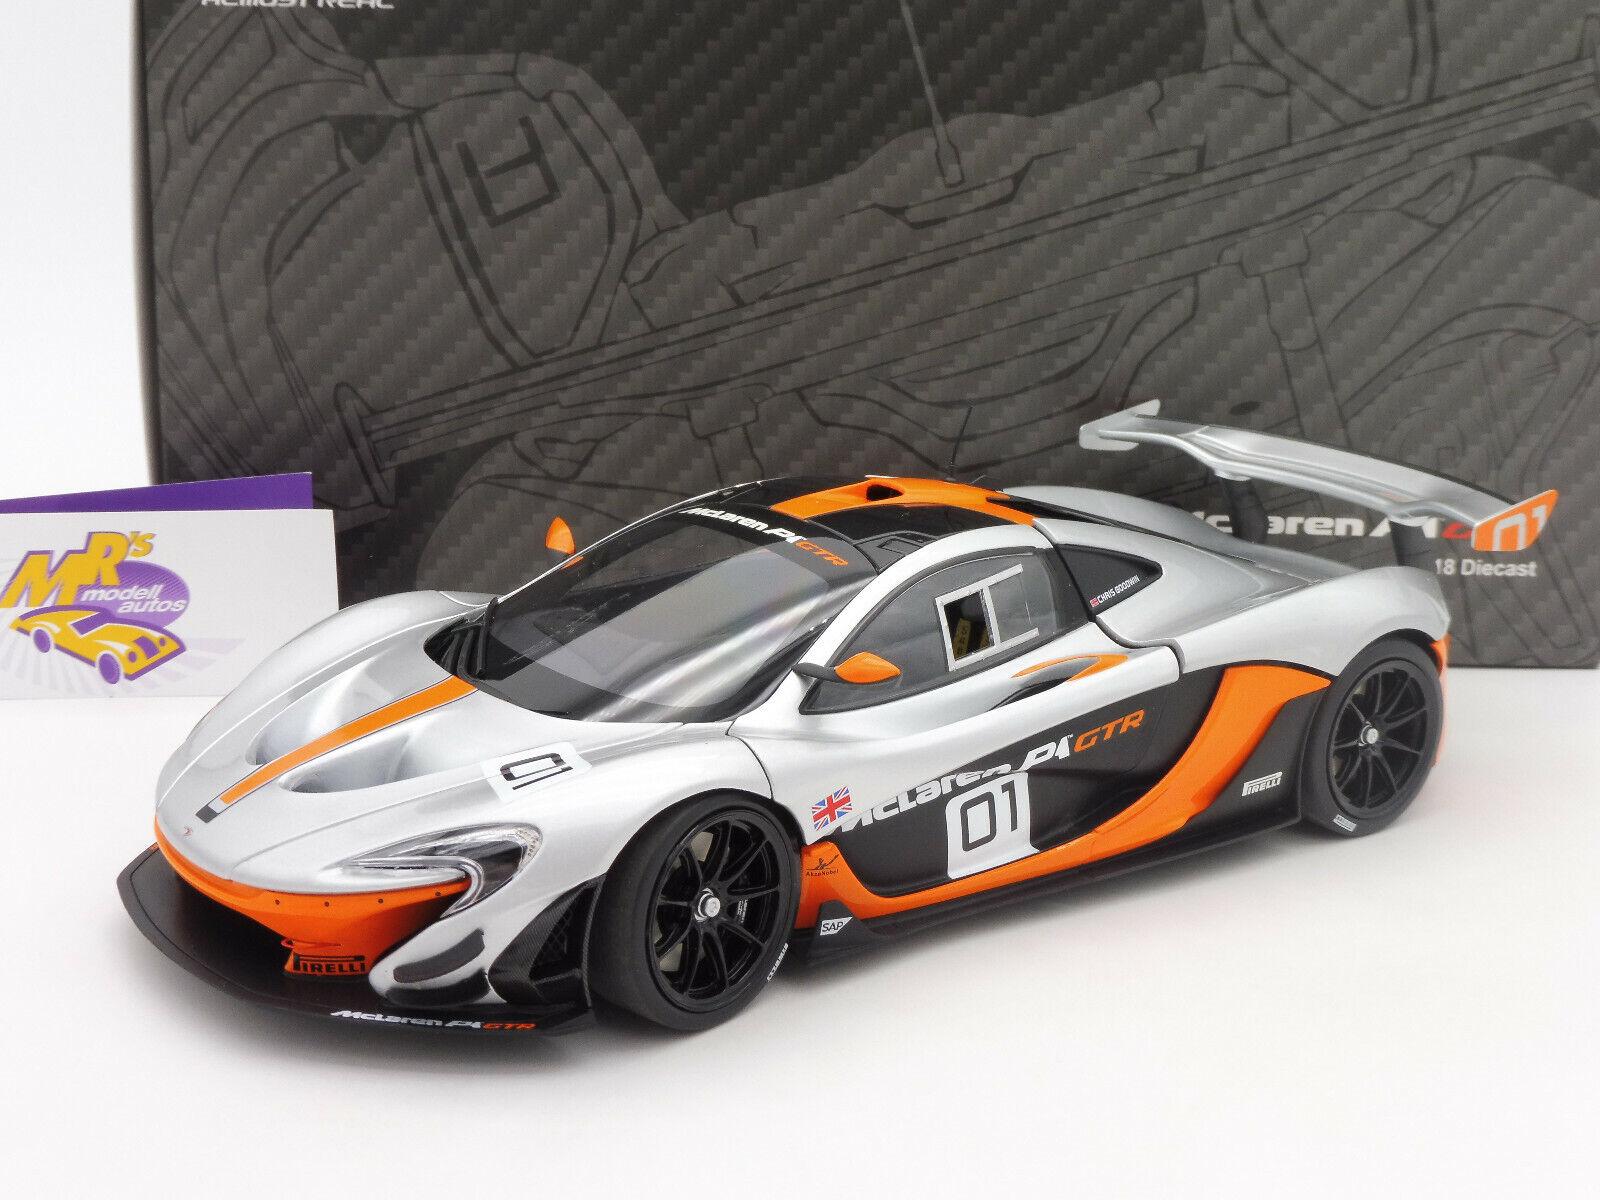 Almost Real 840101   McLaren p1 GTR no. 01 Pebble Beach 2014 argentoOarancia 1 18